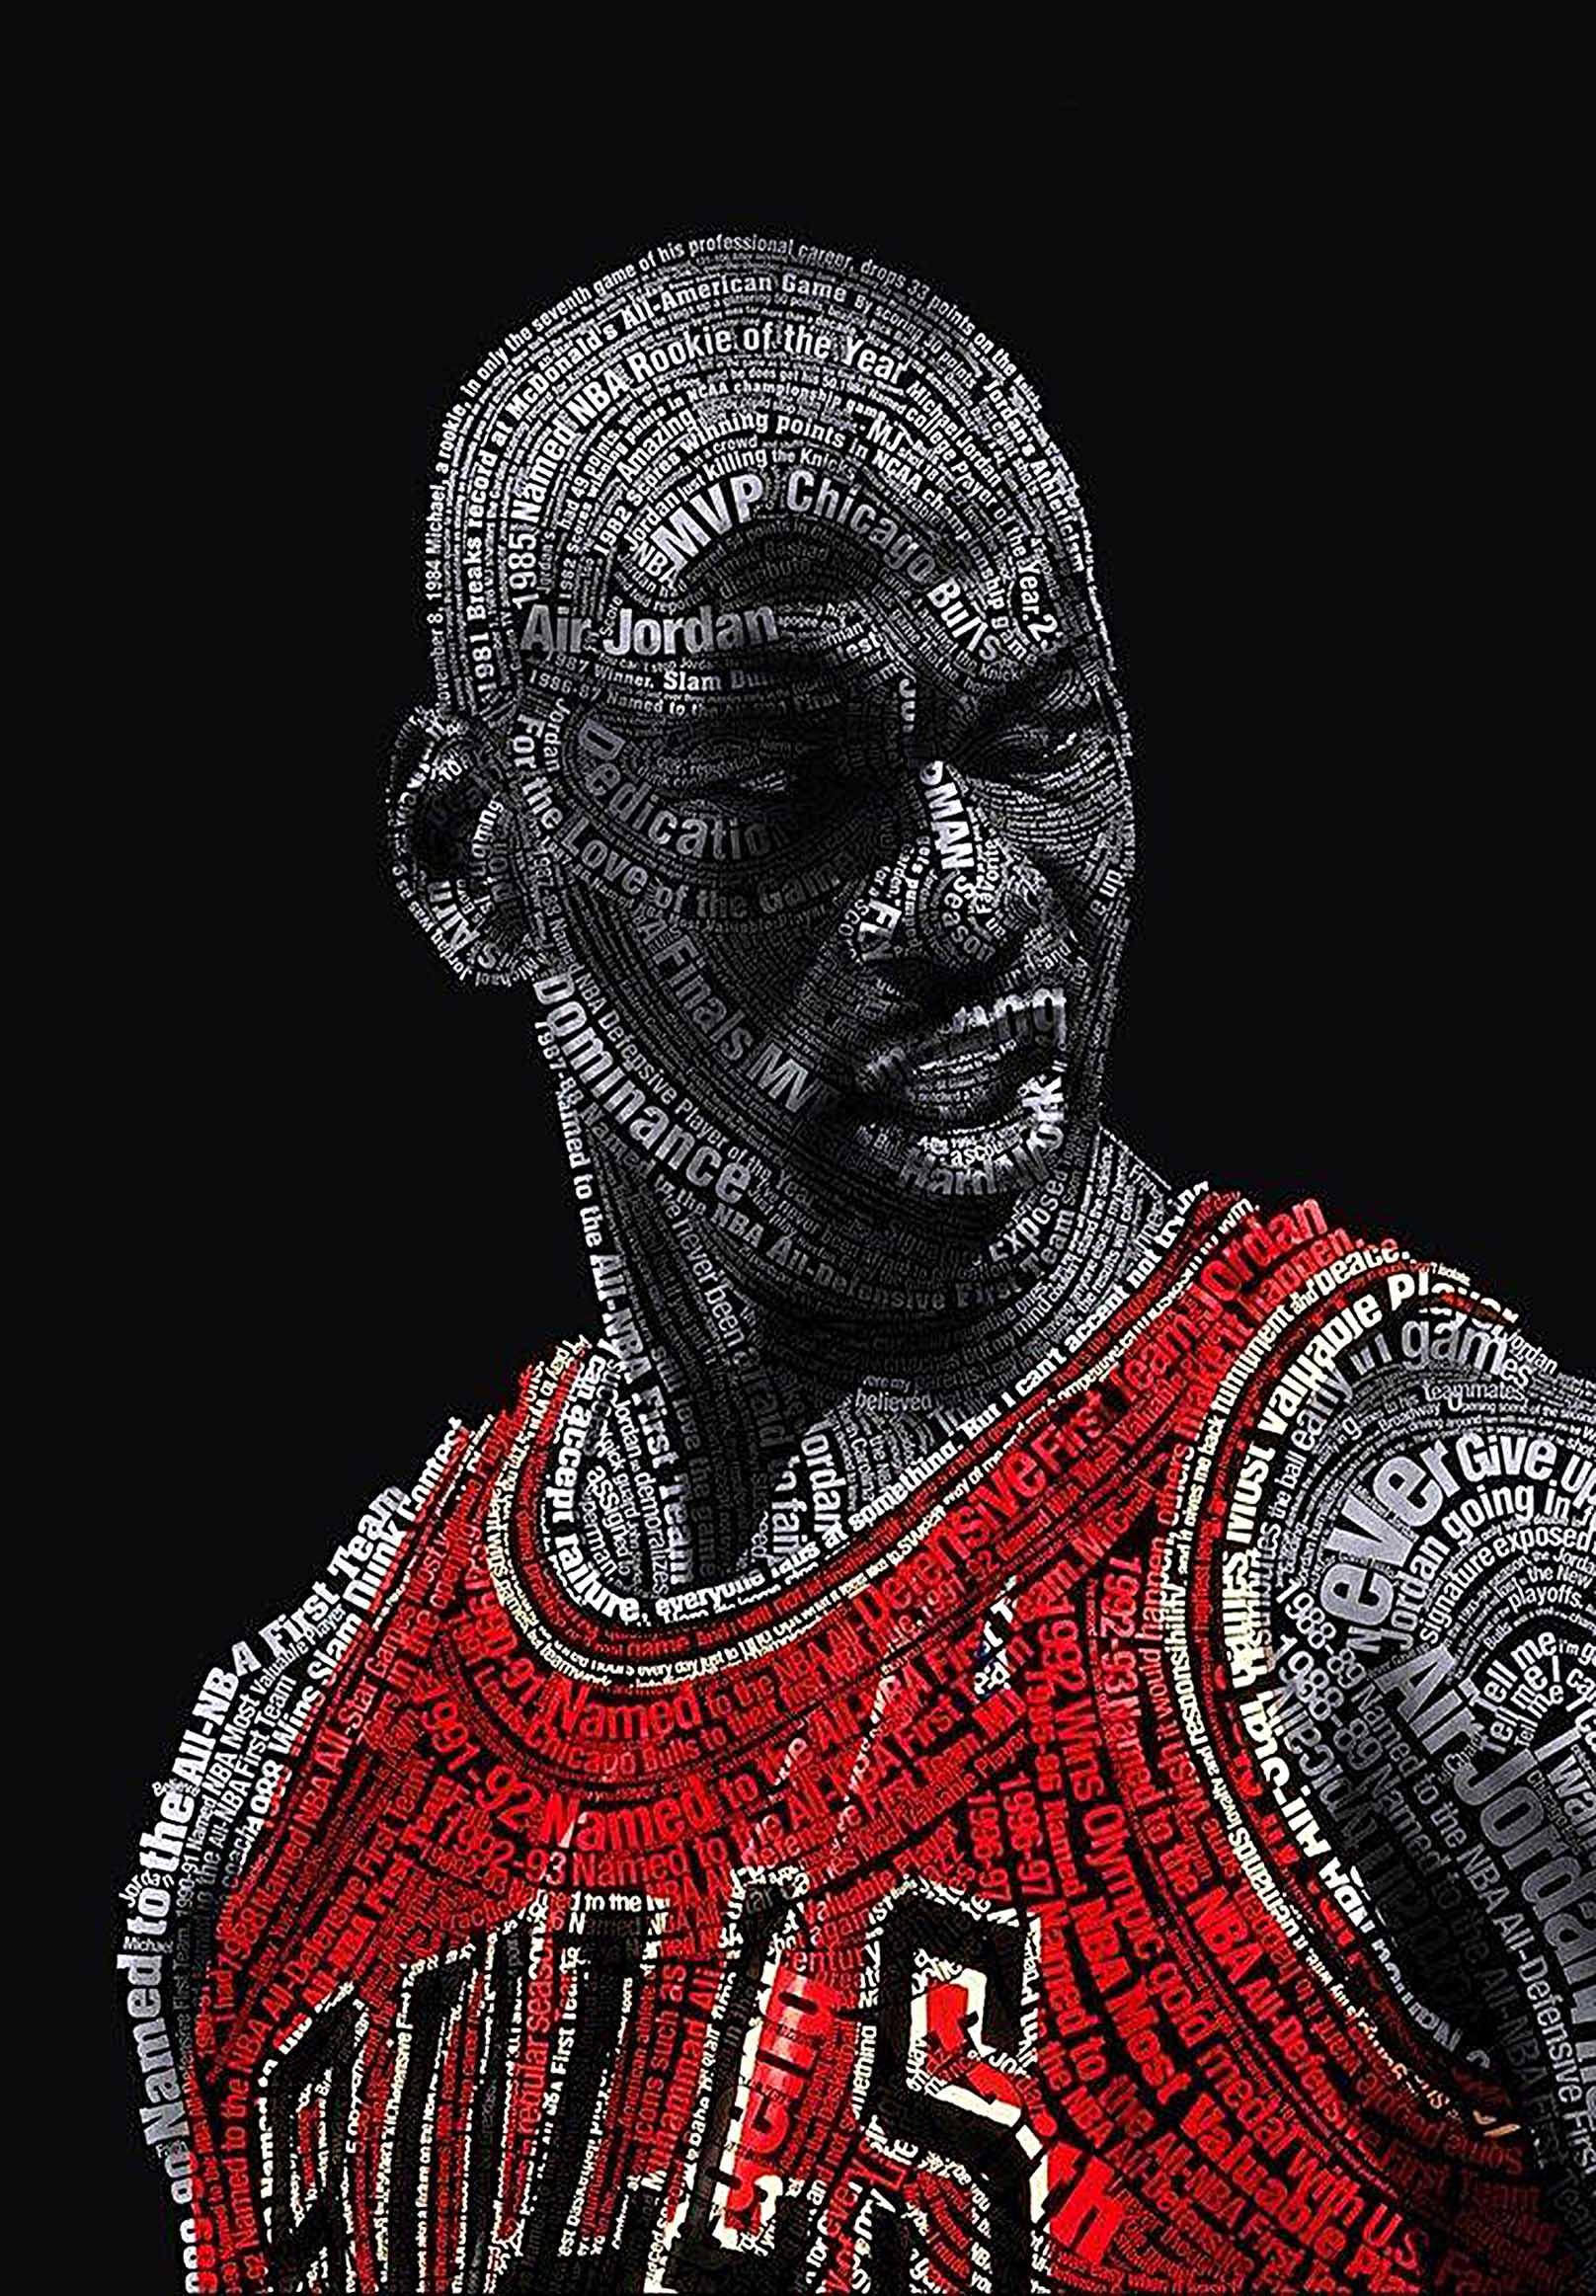 Chicago Bulls Michael Jordan Canvas Tablo (Nba-canvas-jordanmj3)